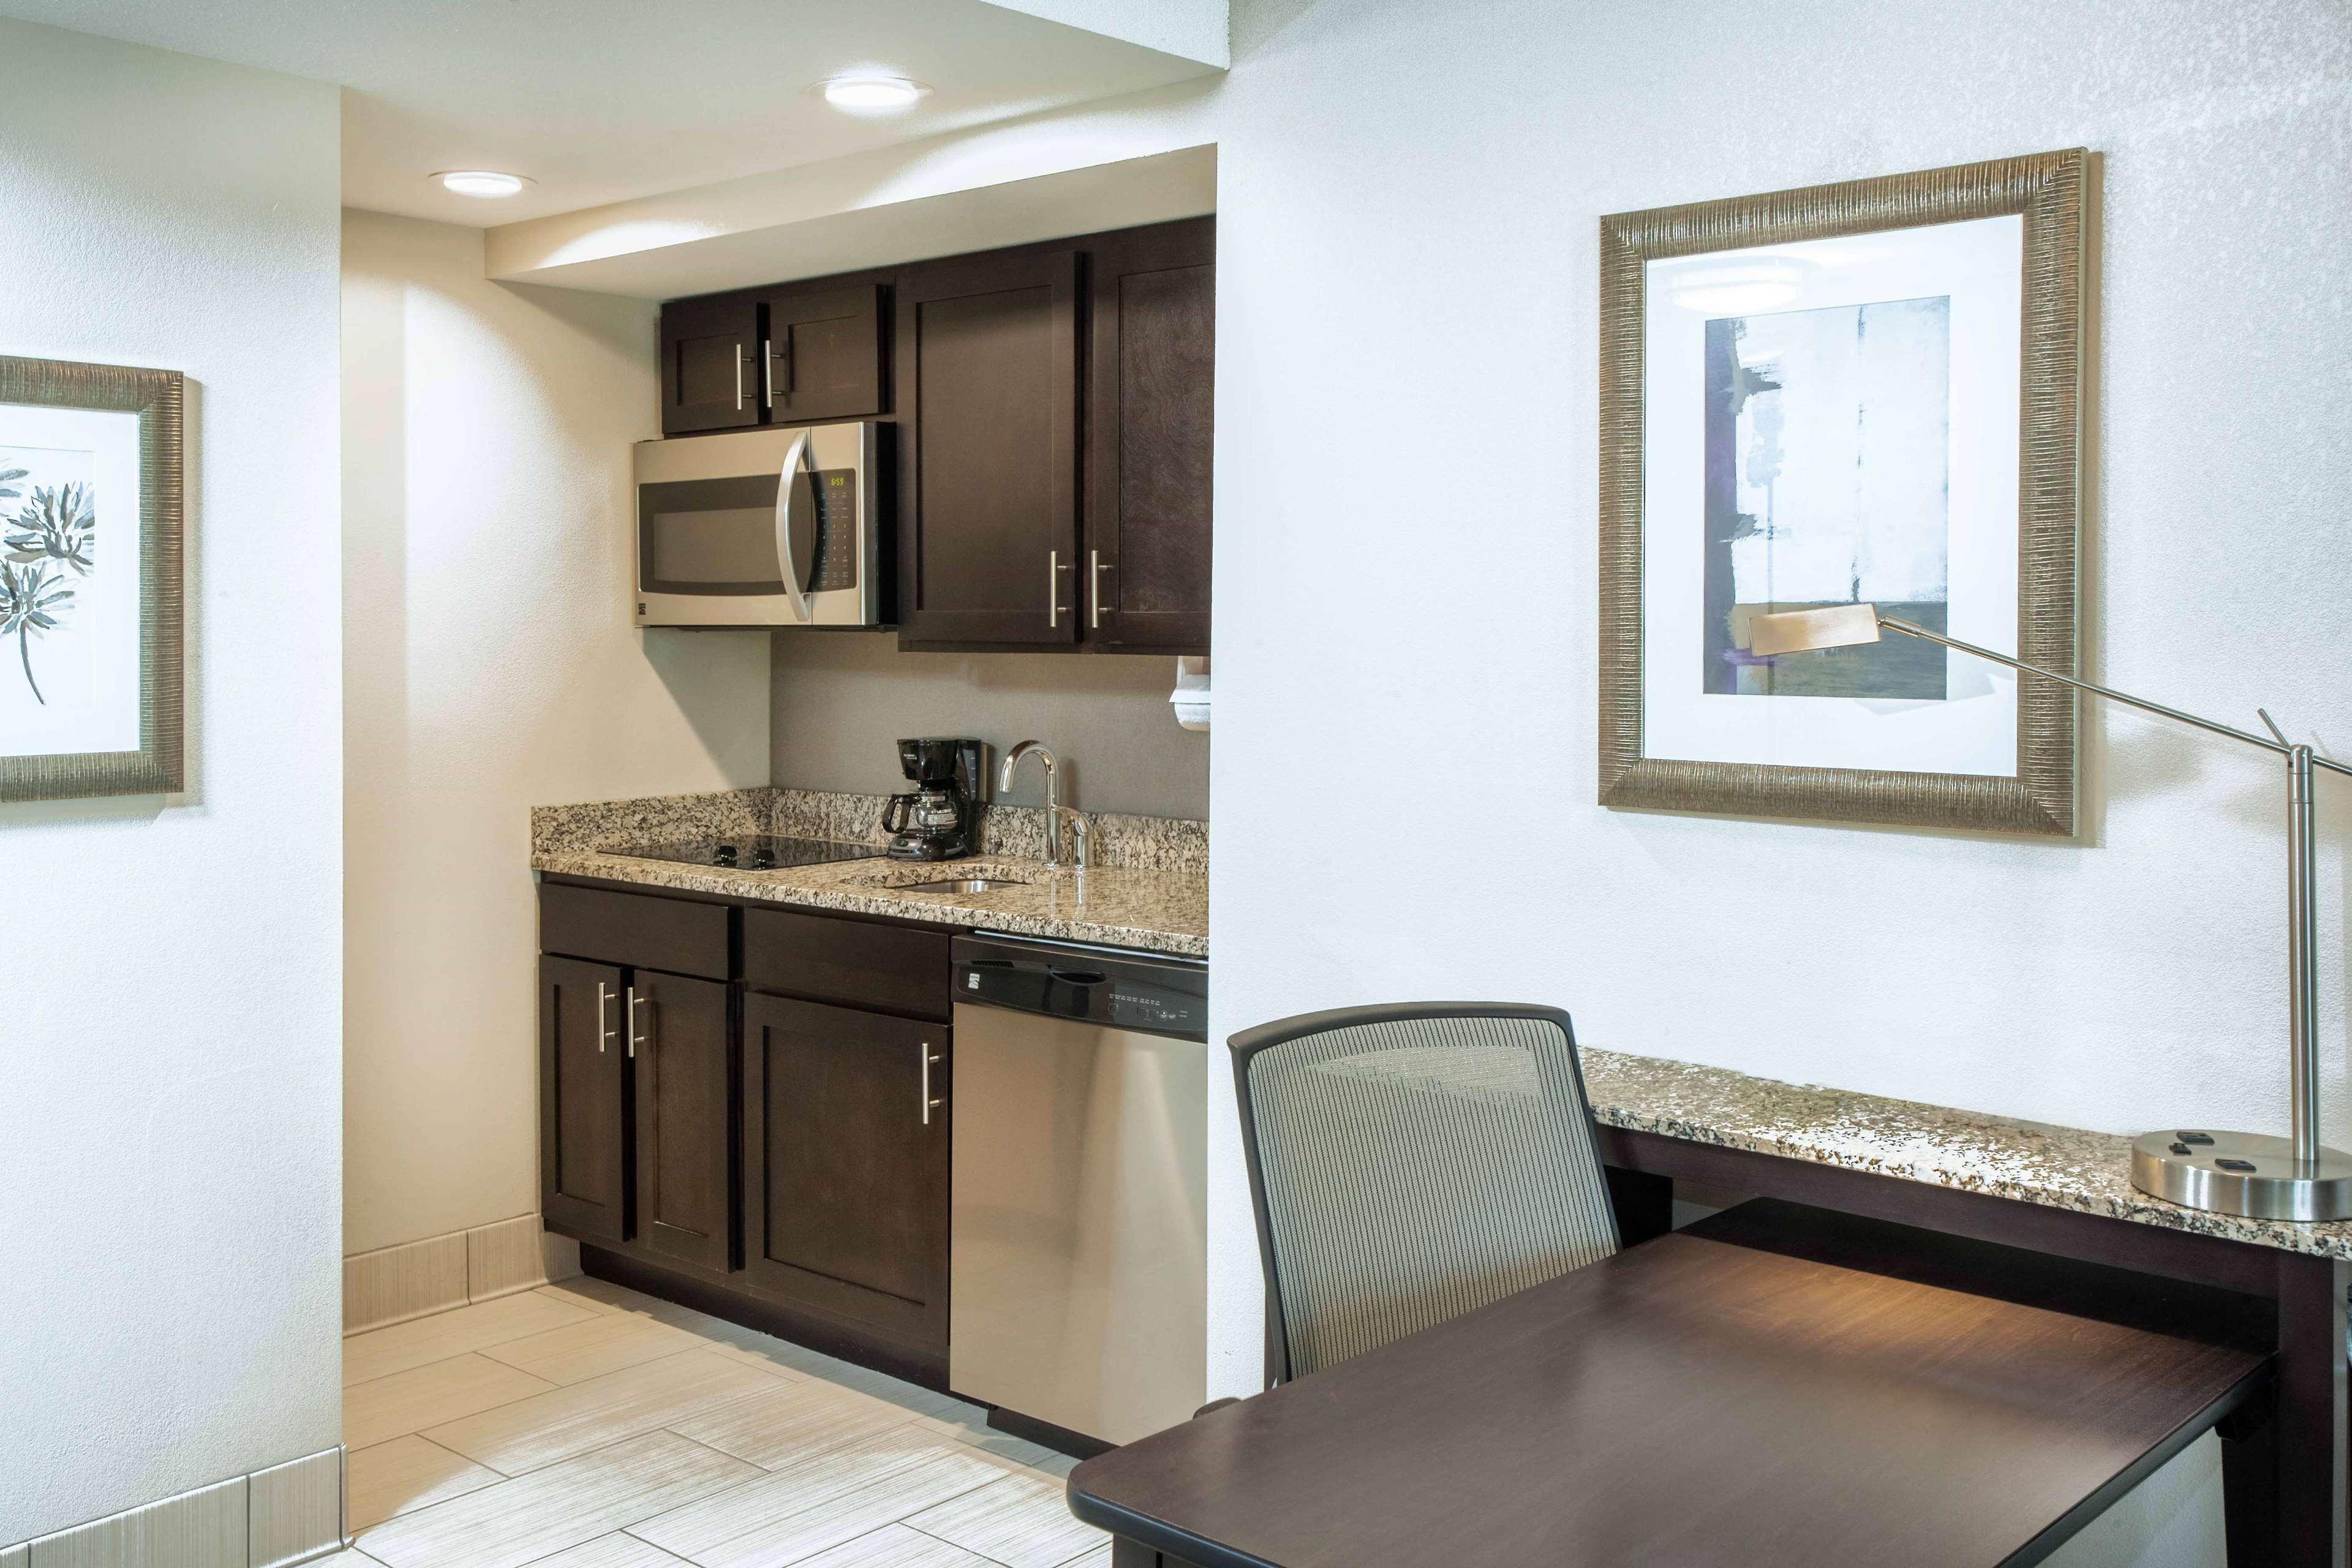 Homewood Suites by Hilton Munster image 6